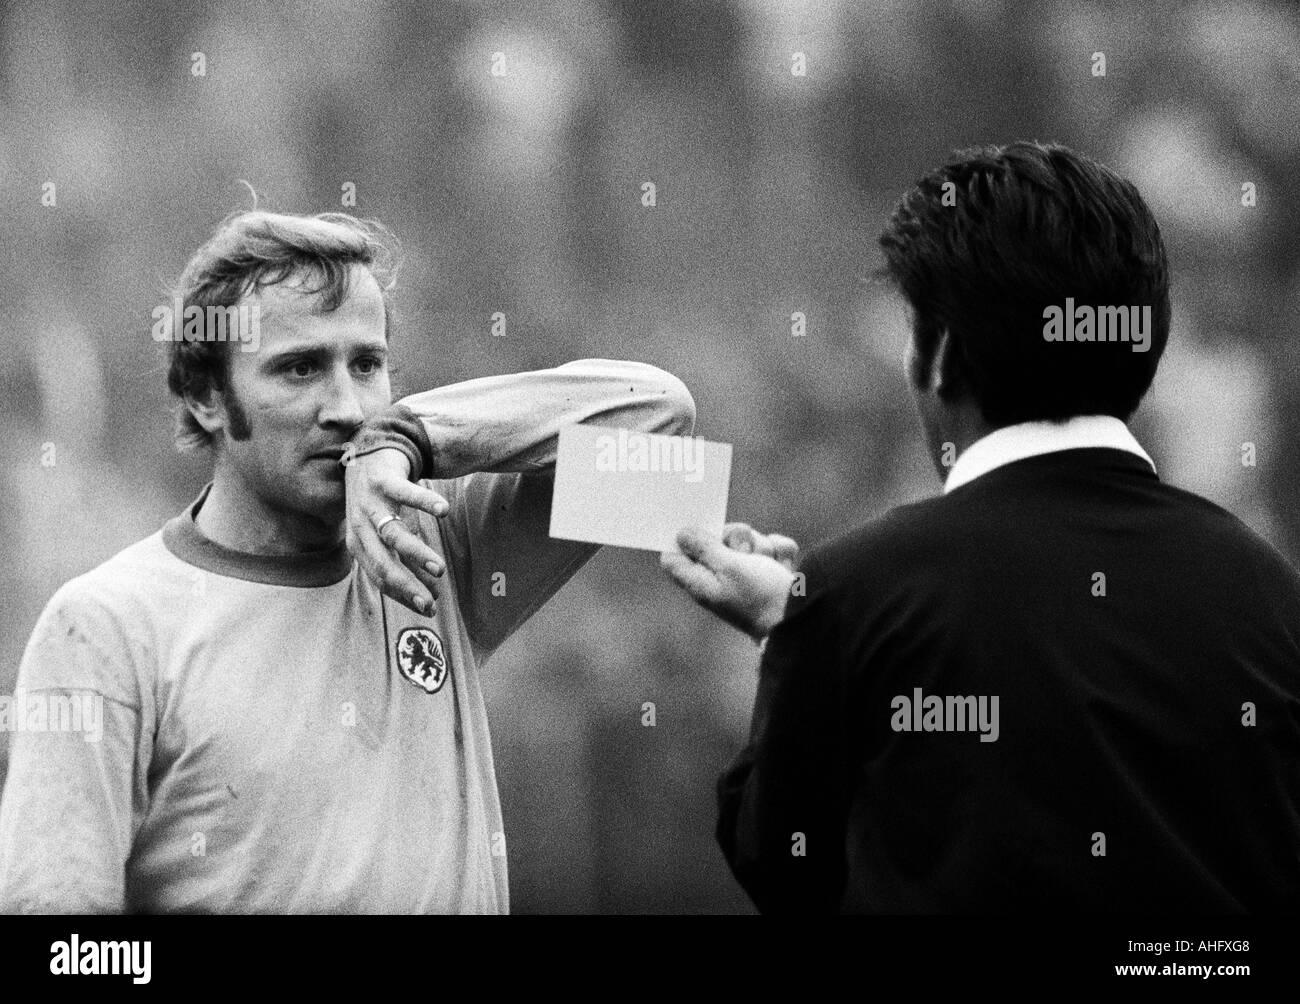 football, Bundesliga, 1972/1973, Boekelberg Stadium, Borussia Moenchengladbach versus Eintracht Brunswick 4:0, scene of the match, referee Dieter Berner from Enzberg yellow-cards Wolfgang Grzyb (BS) - Stock Image